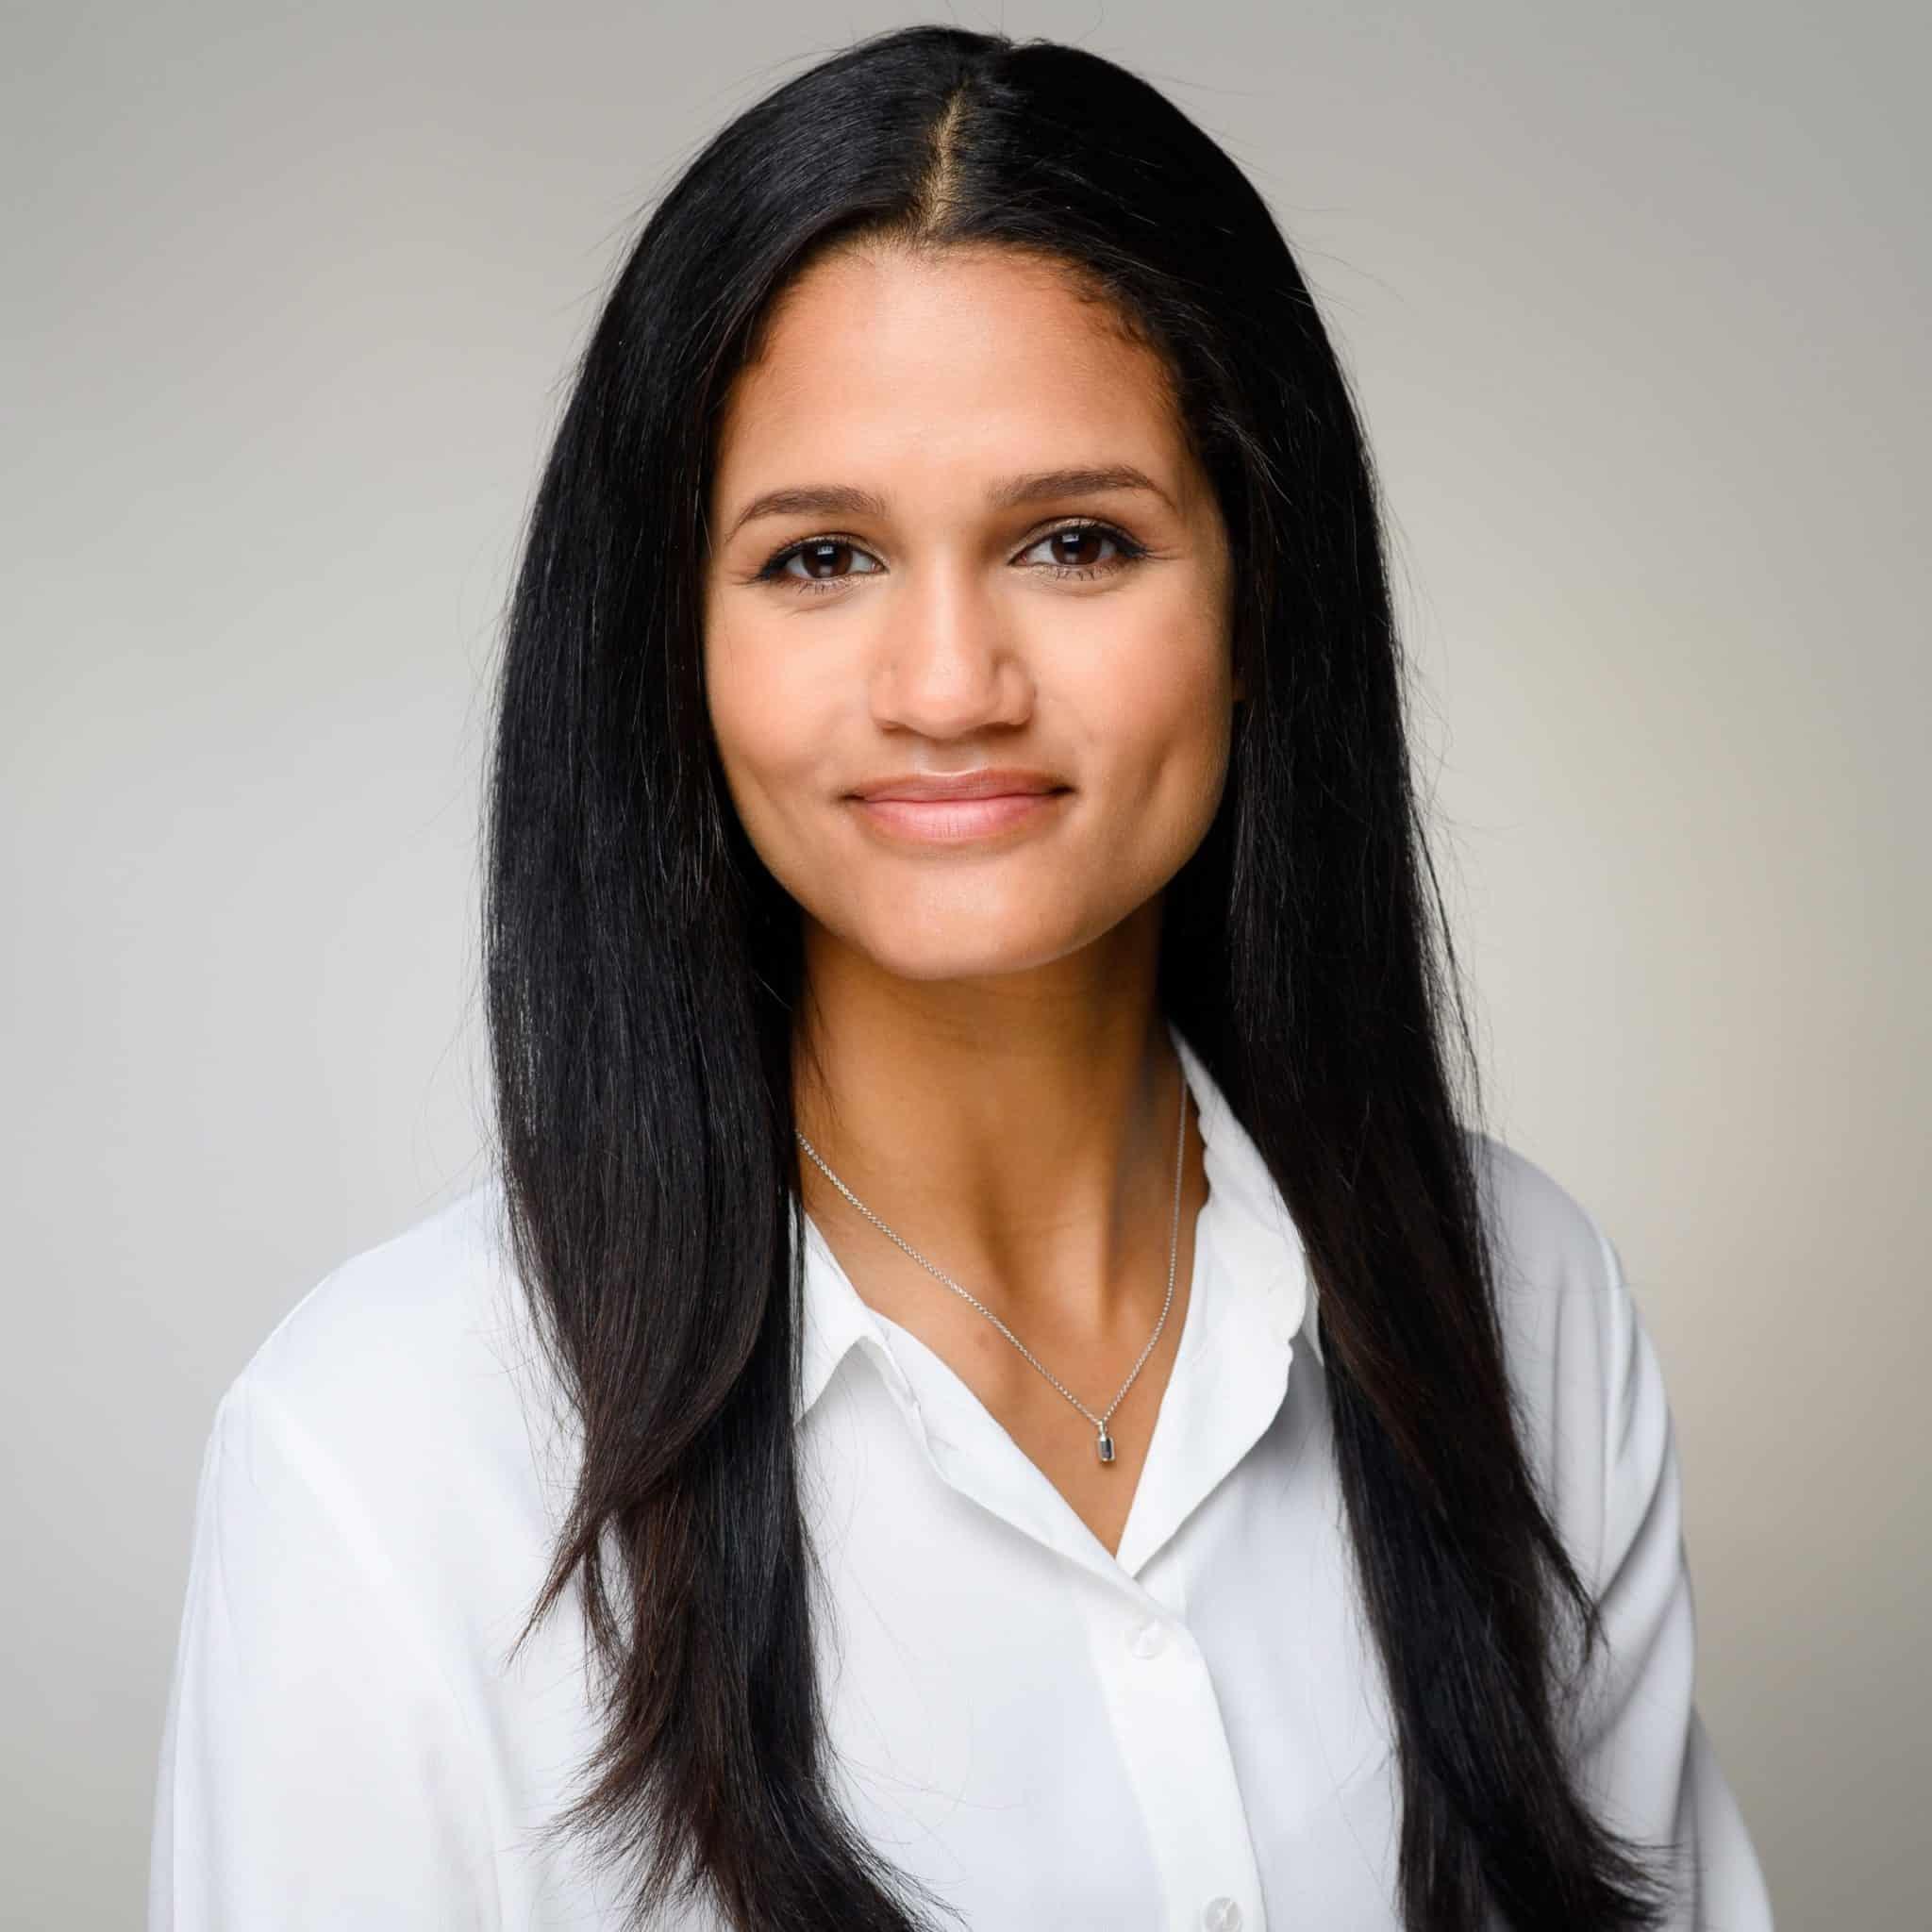 M. Sc. Psych. Katharina Ndiribe - Psychologische Psychotherapeutin in München Lehel